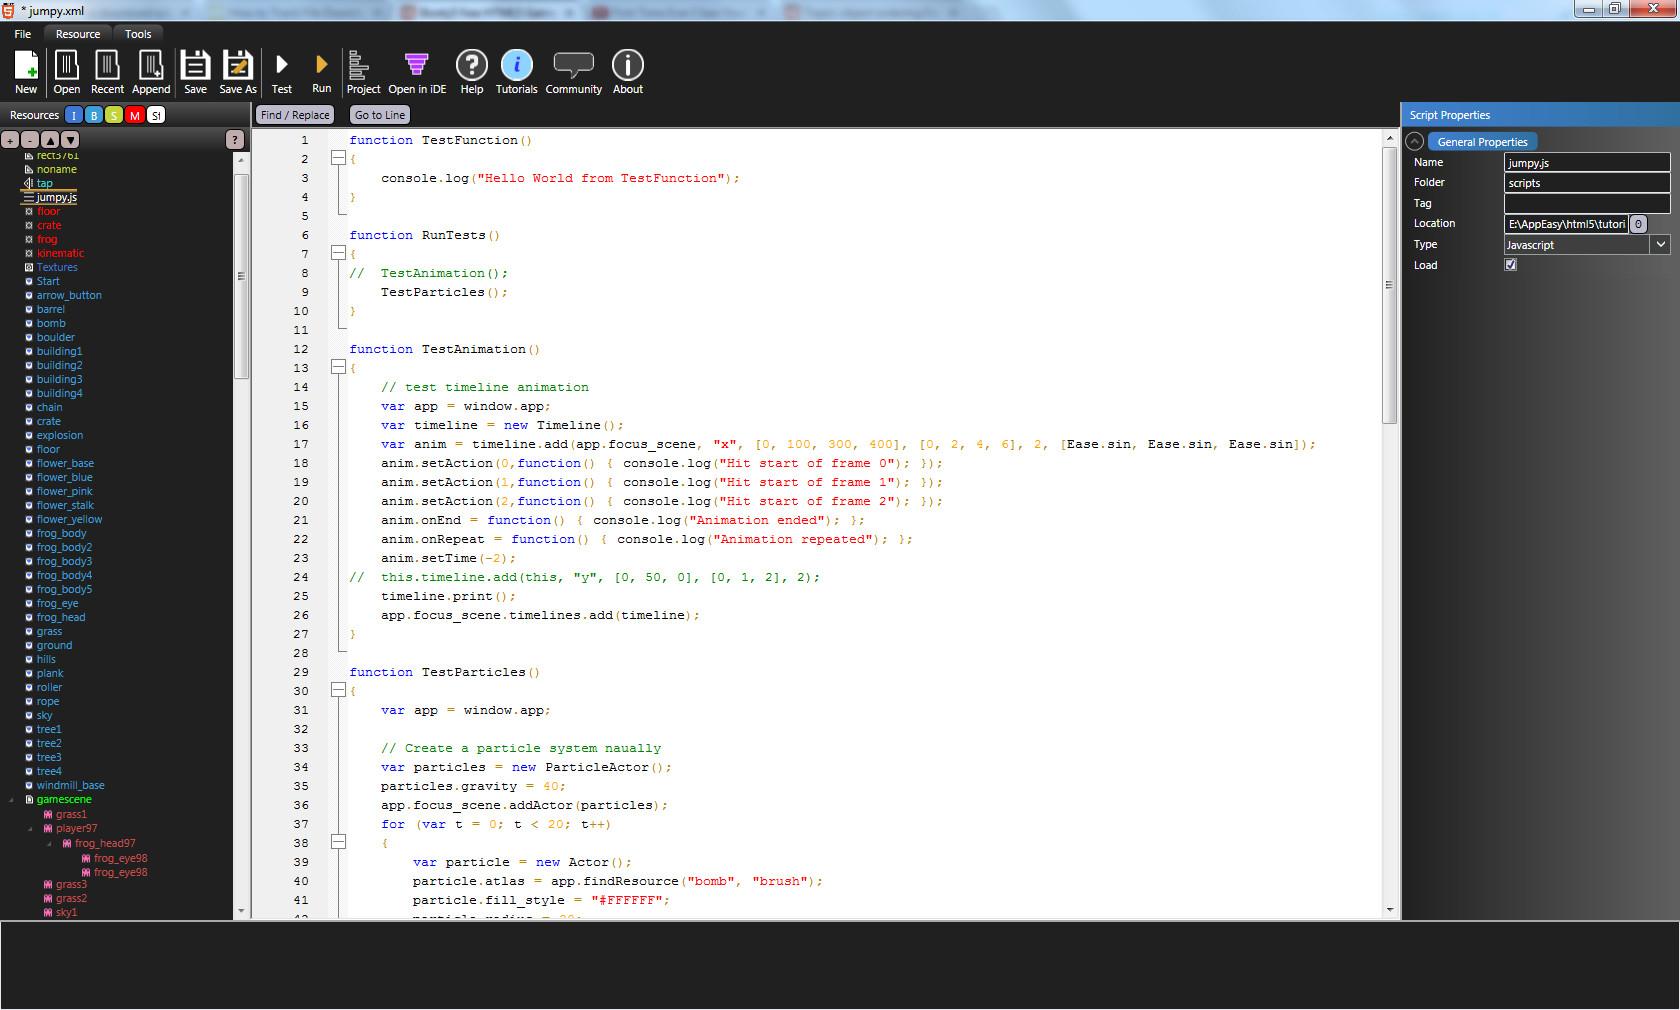 booty5_code_editor1.jpg